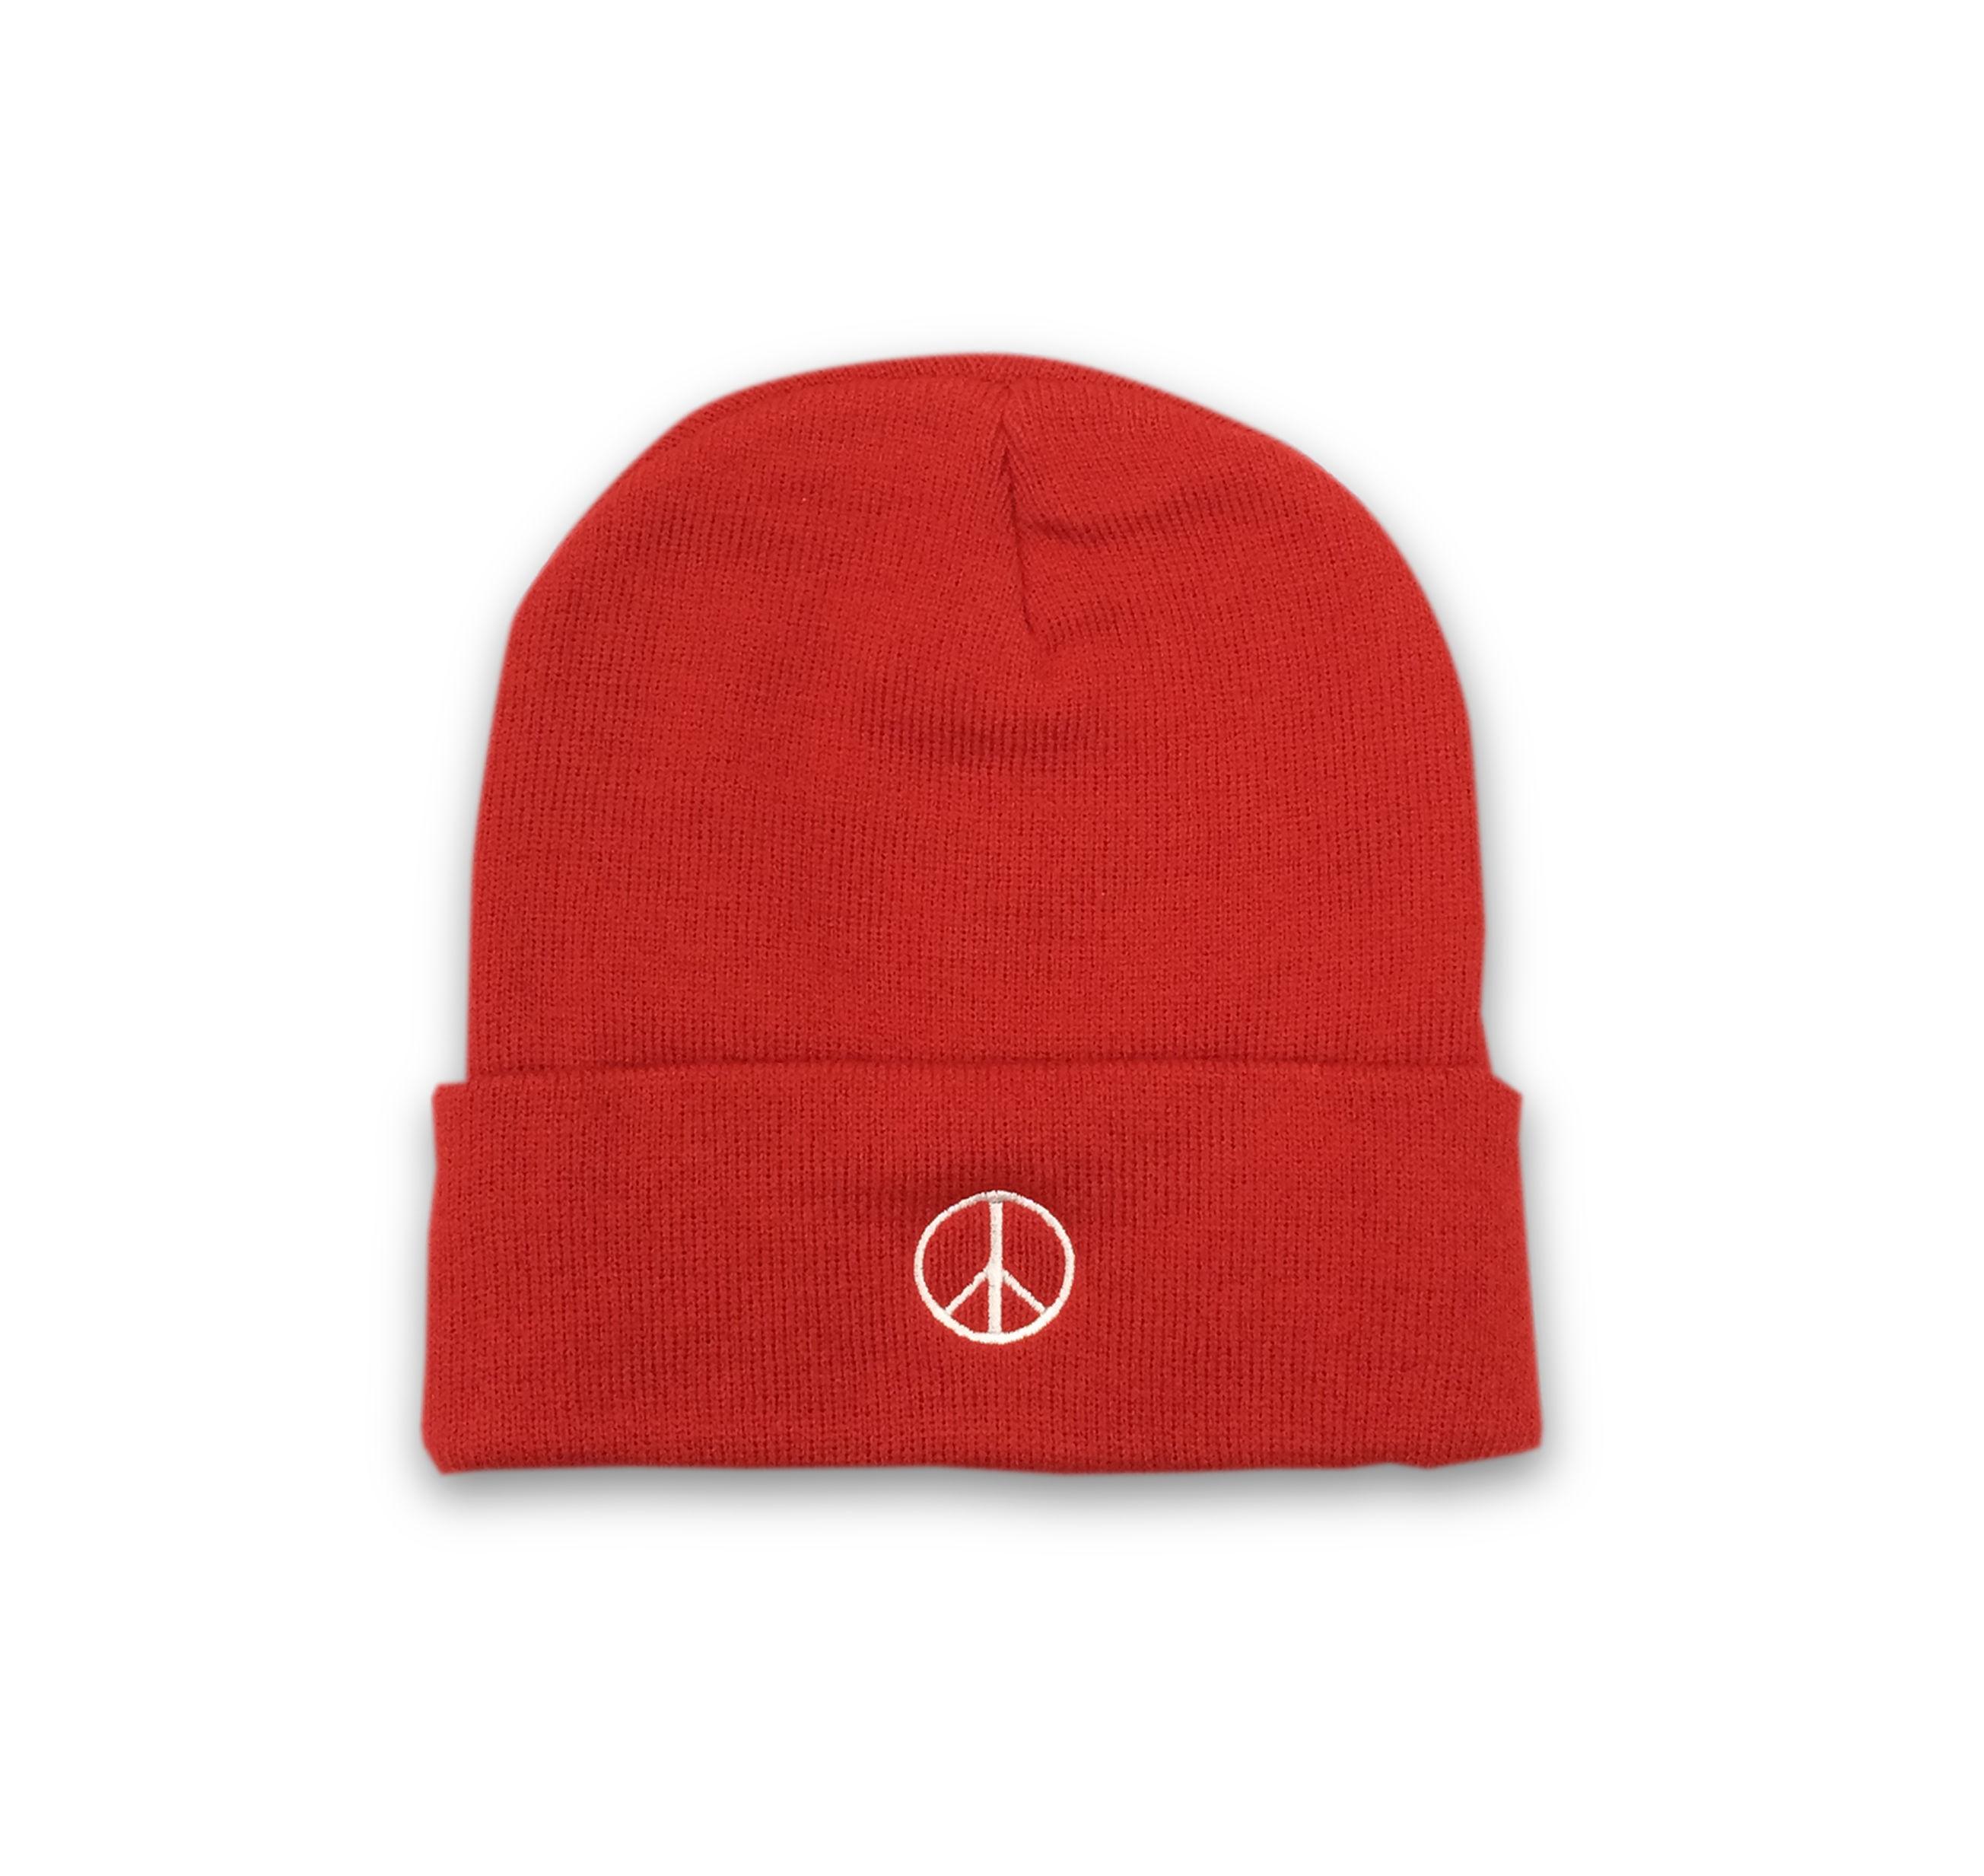 PEACE BEANIE (RED)